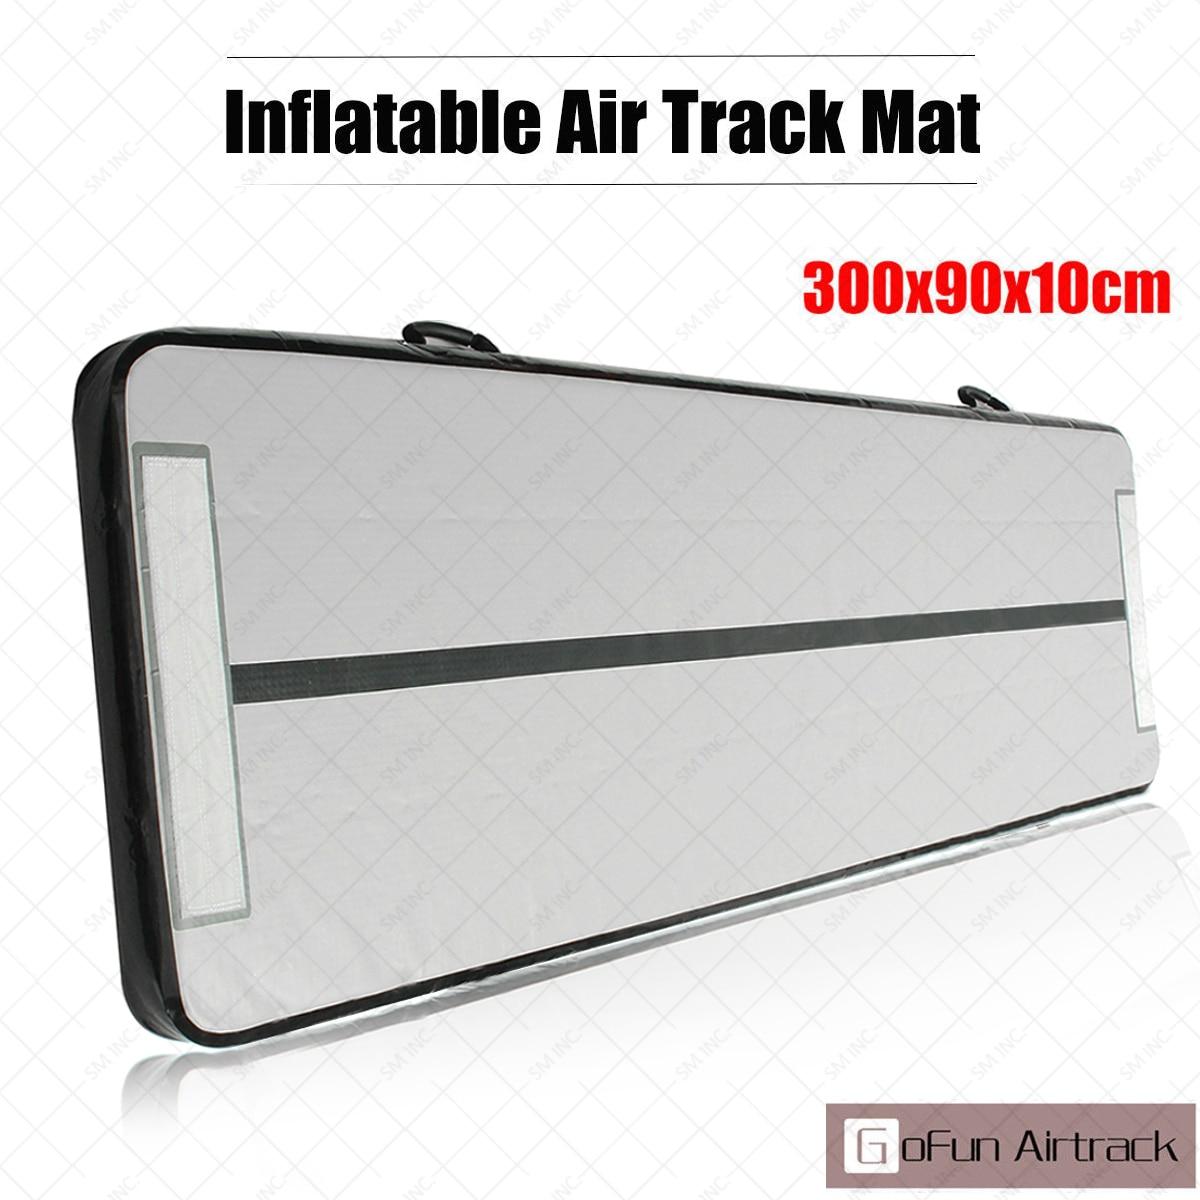 Cheerleading Mini Inflatable Gymnastics Airtrack Tumbling Air Mat Floor For Home Use Training